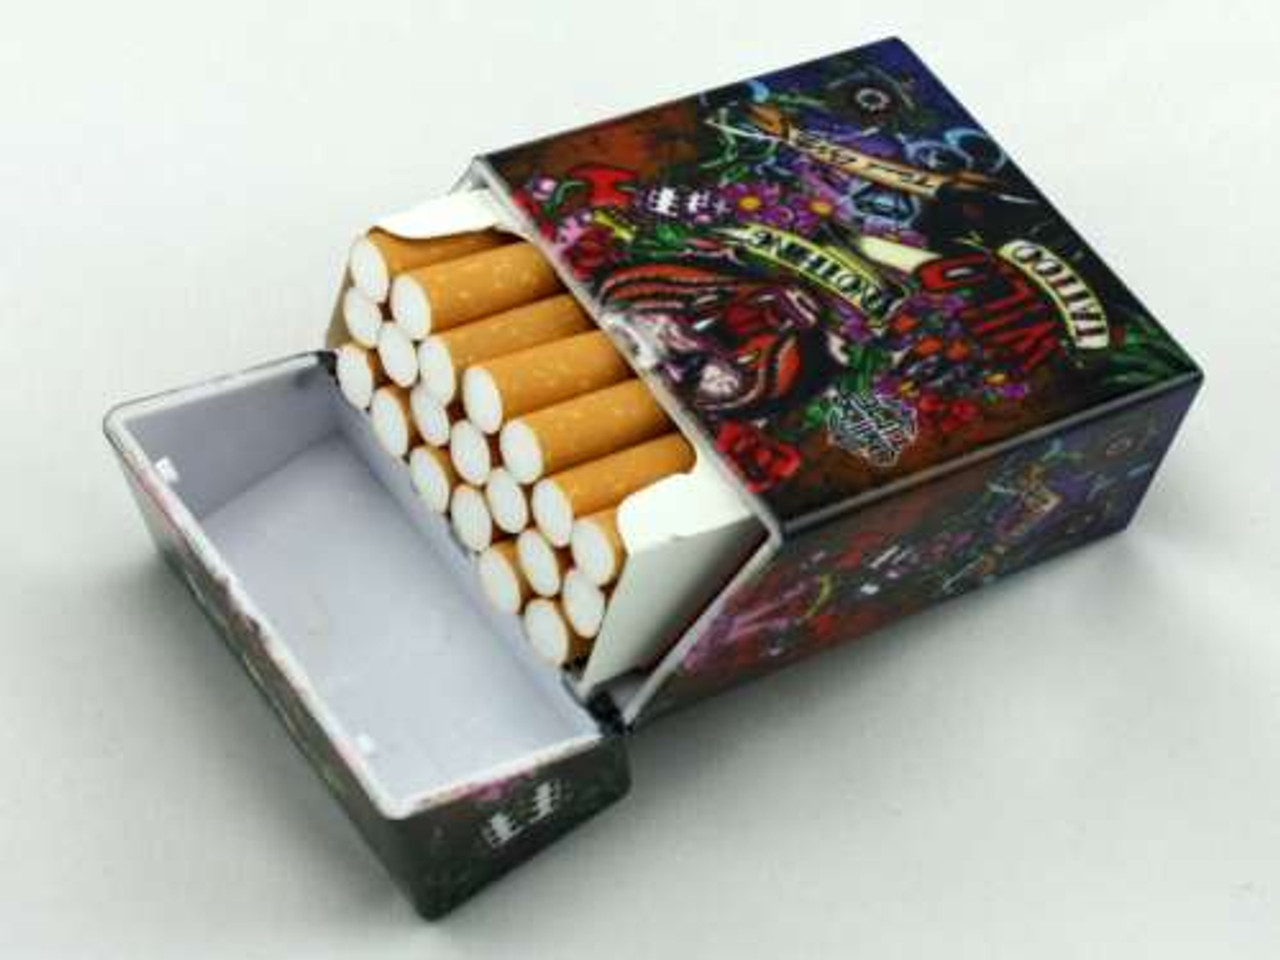 Dice Tattoo Cigarette Pack Holder